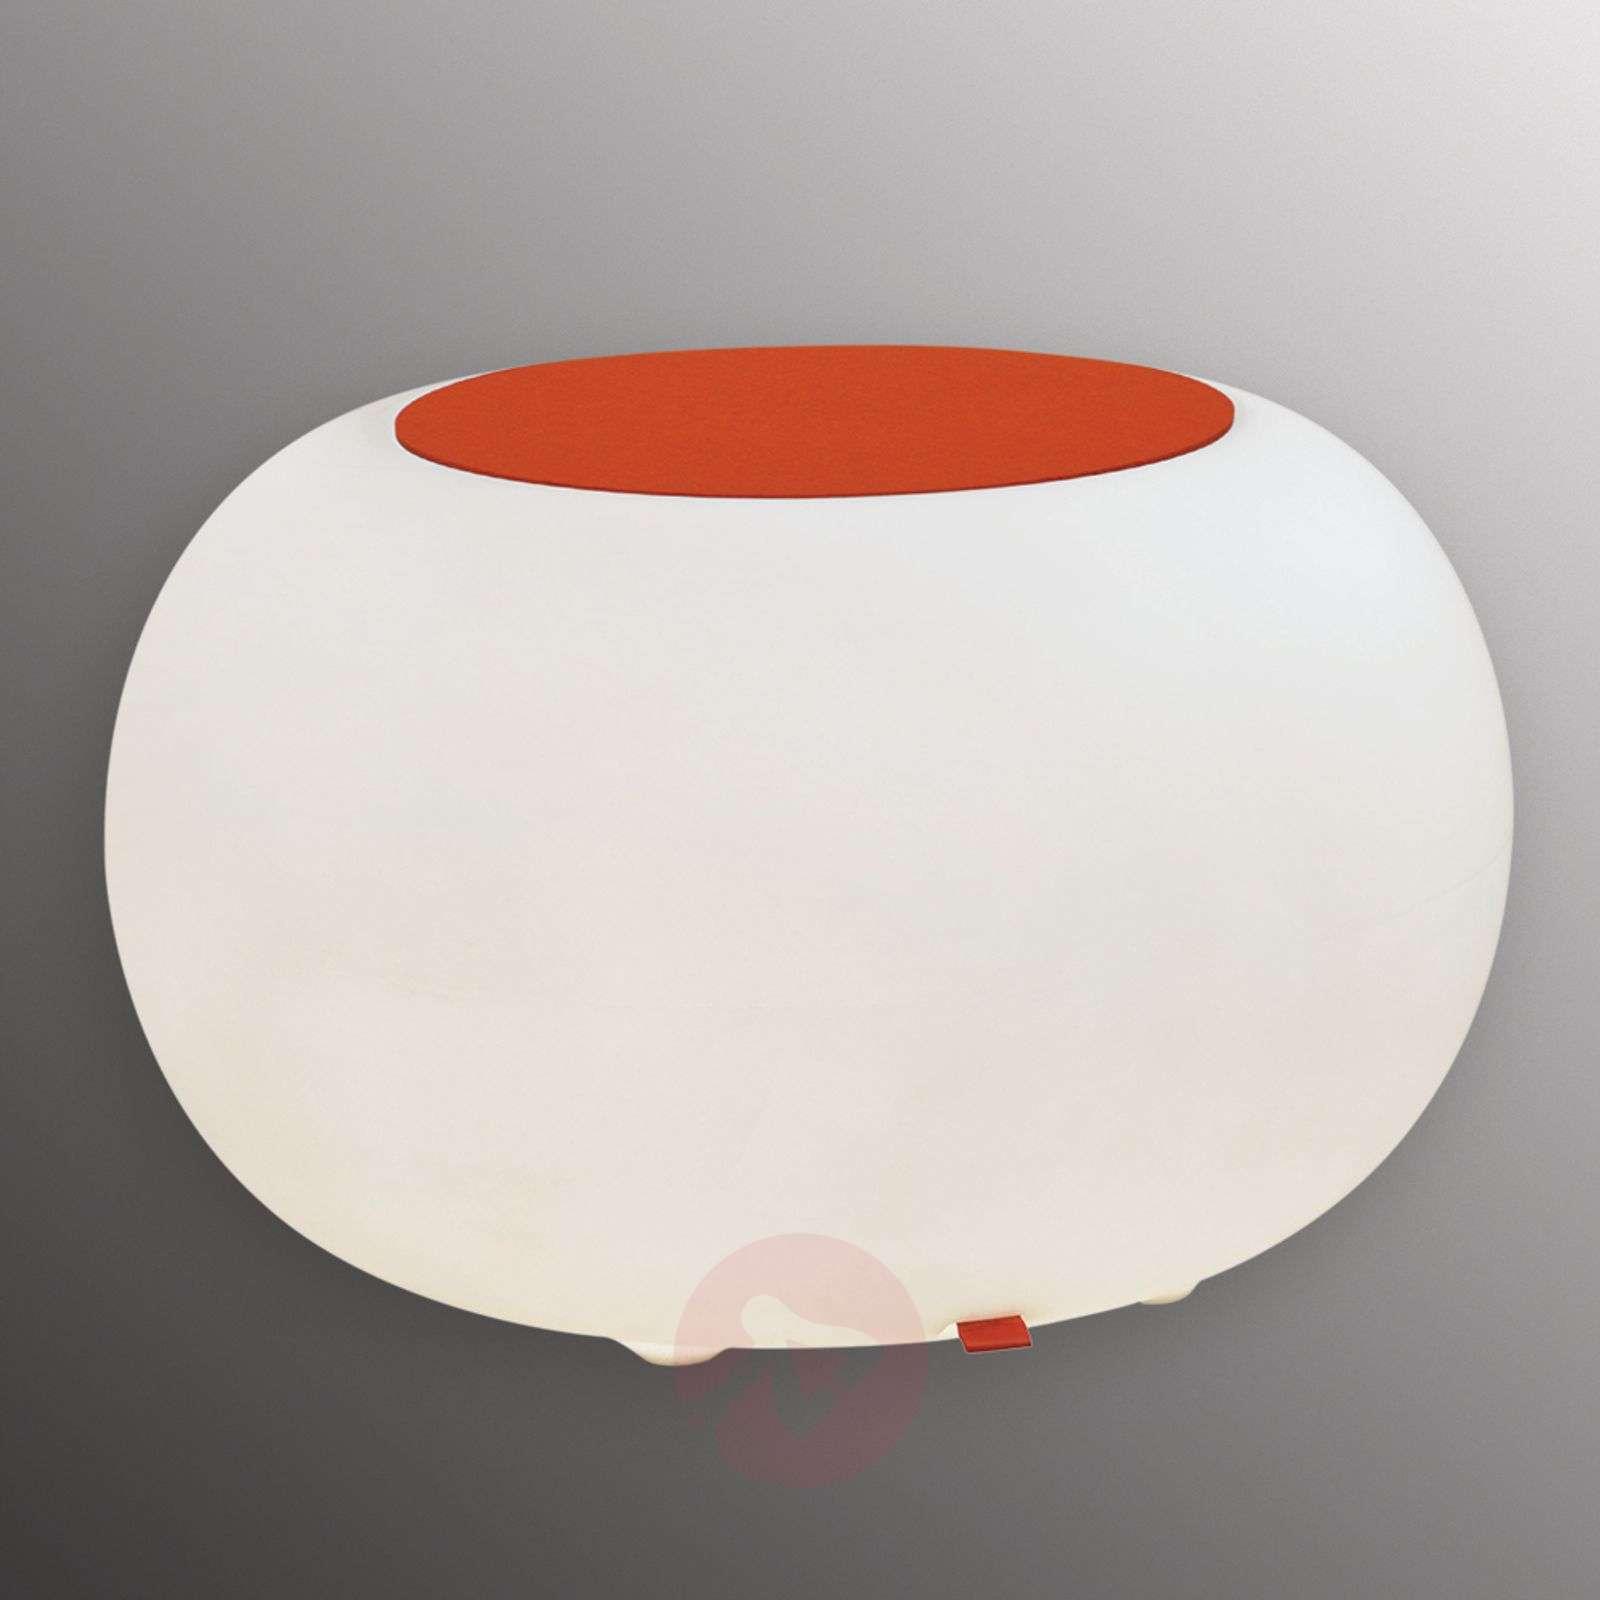 Bubble LED Accu Outdoor pöytä huopa oranssi-6537084-01